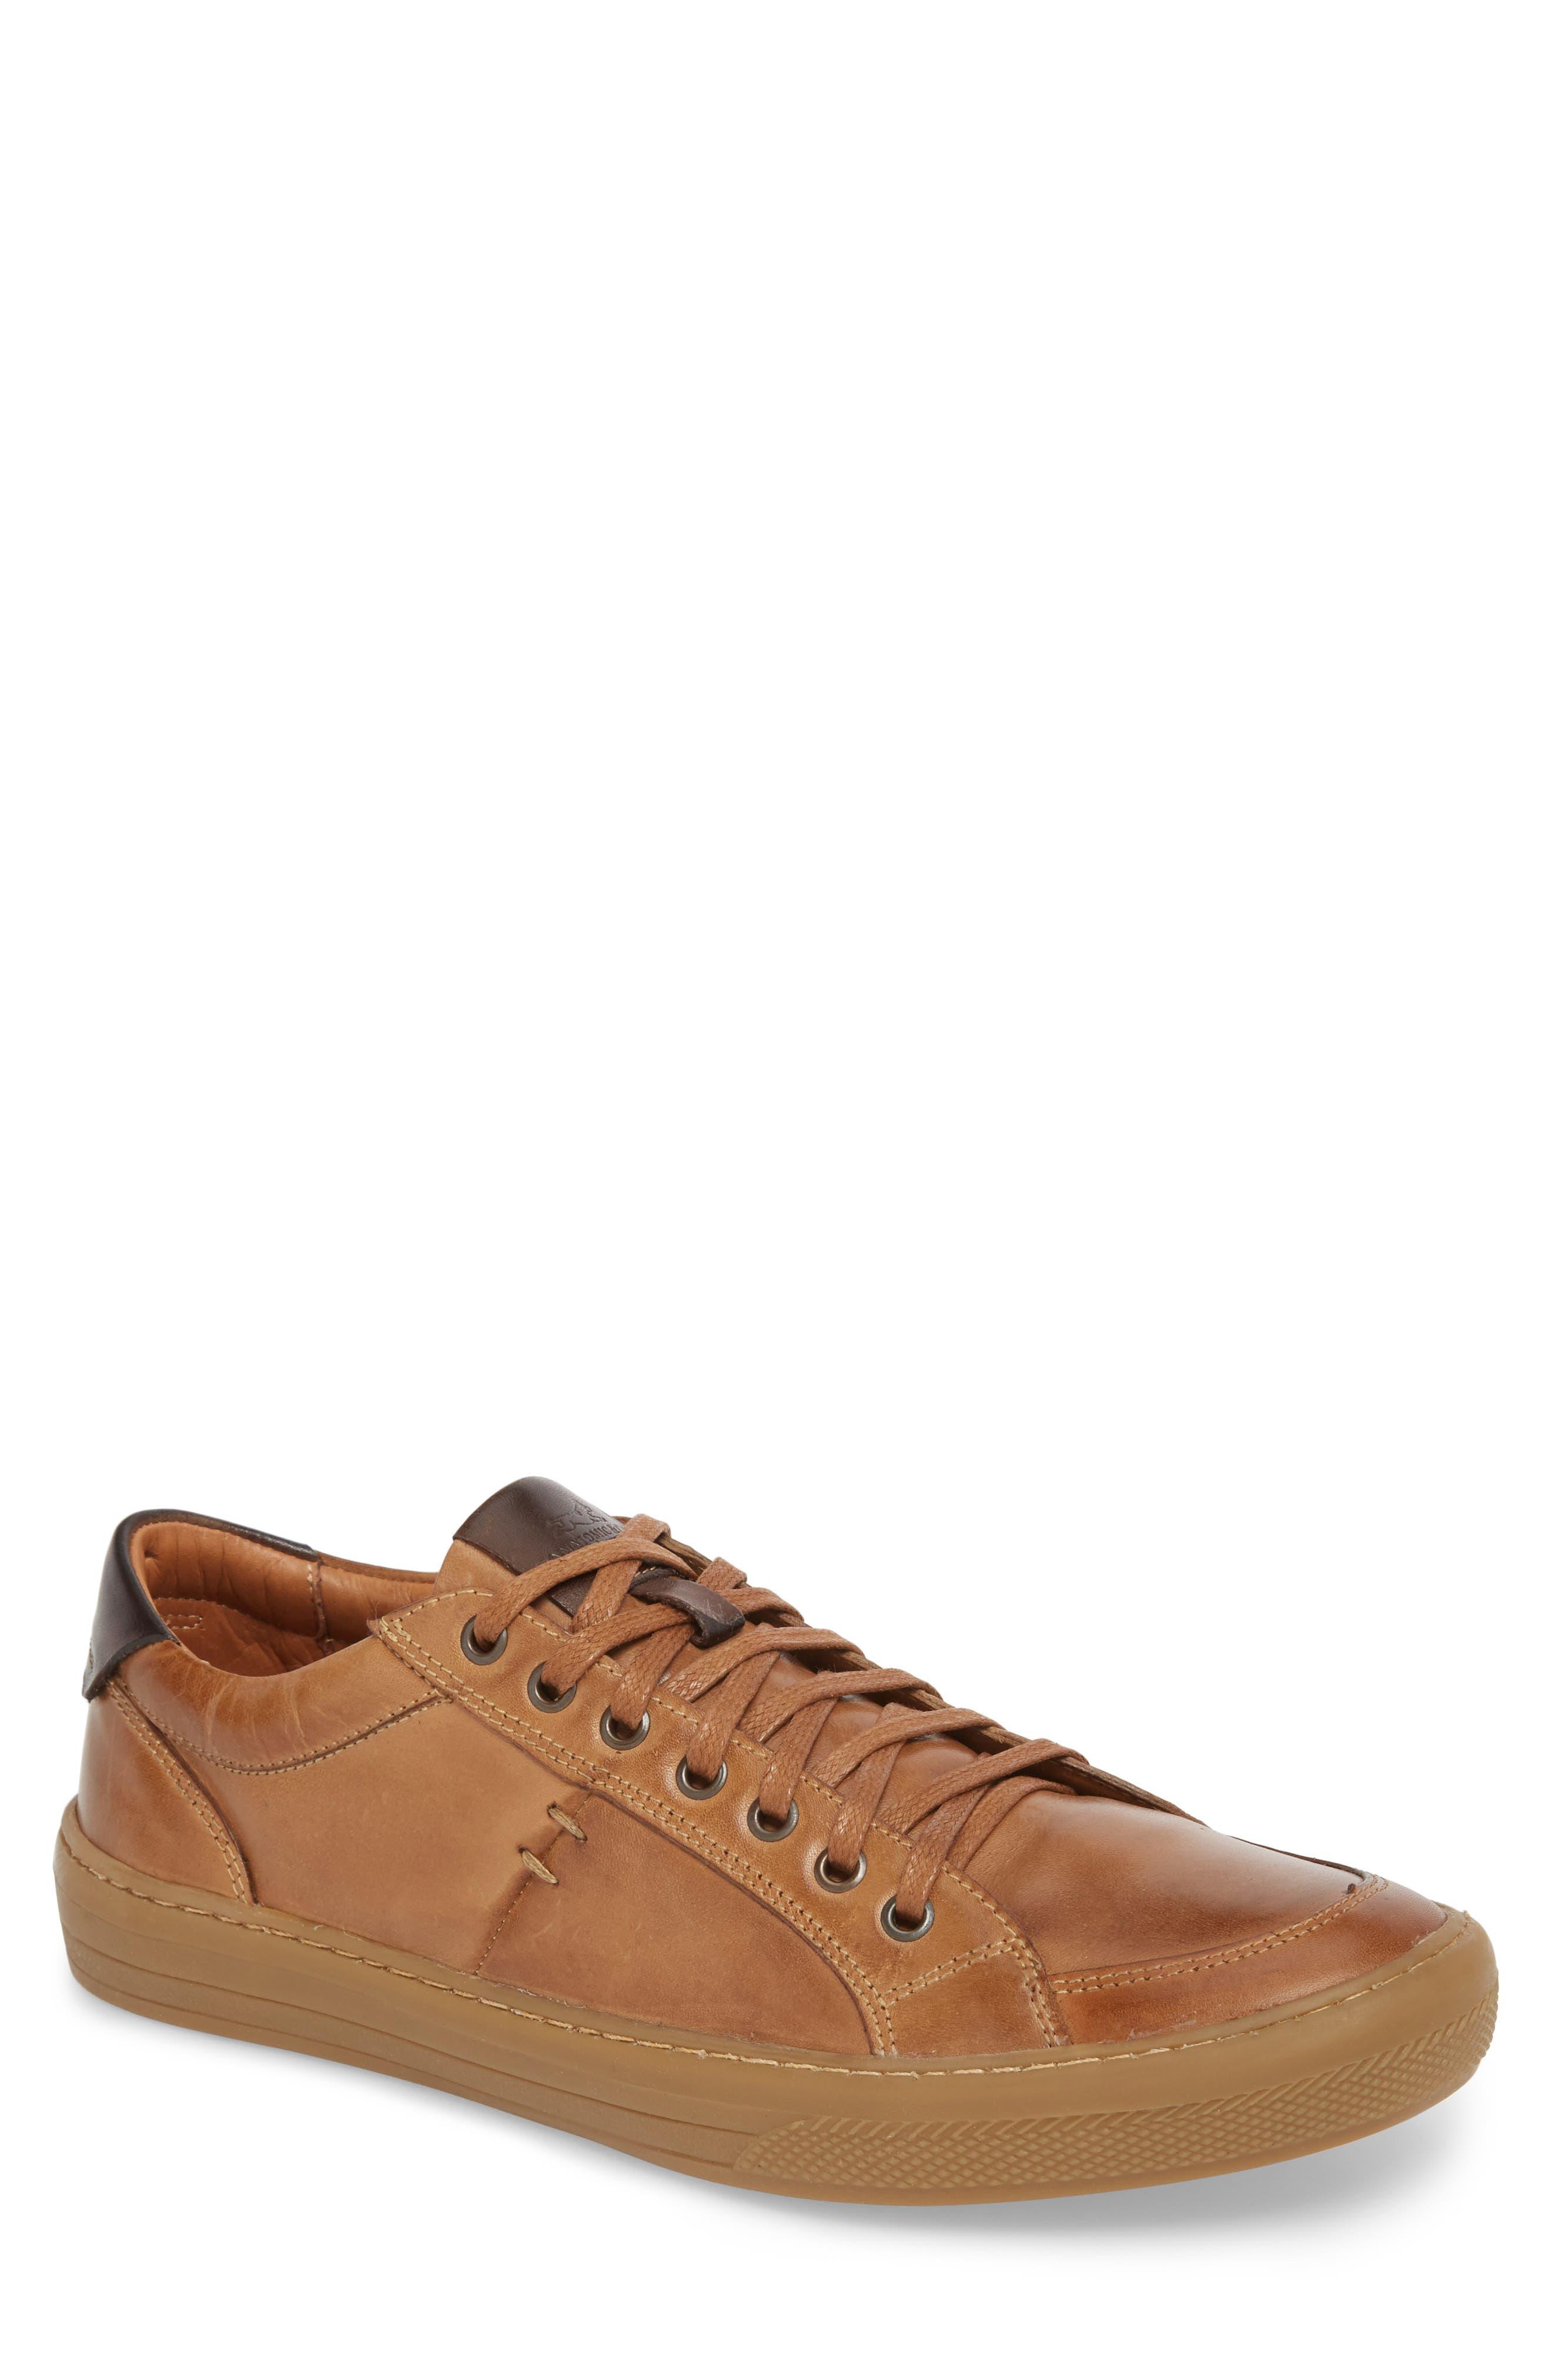 Bilac Low Top Sneaker,                             Main thumbnail 1, color,                             Touch Bronze/ Castanho Leather